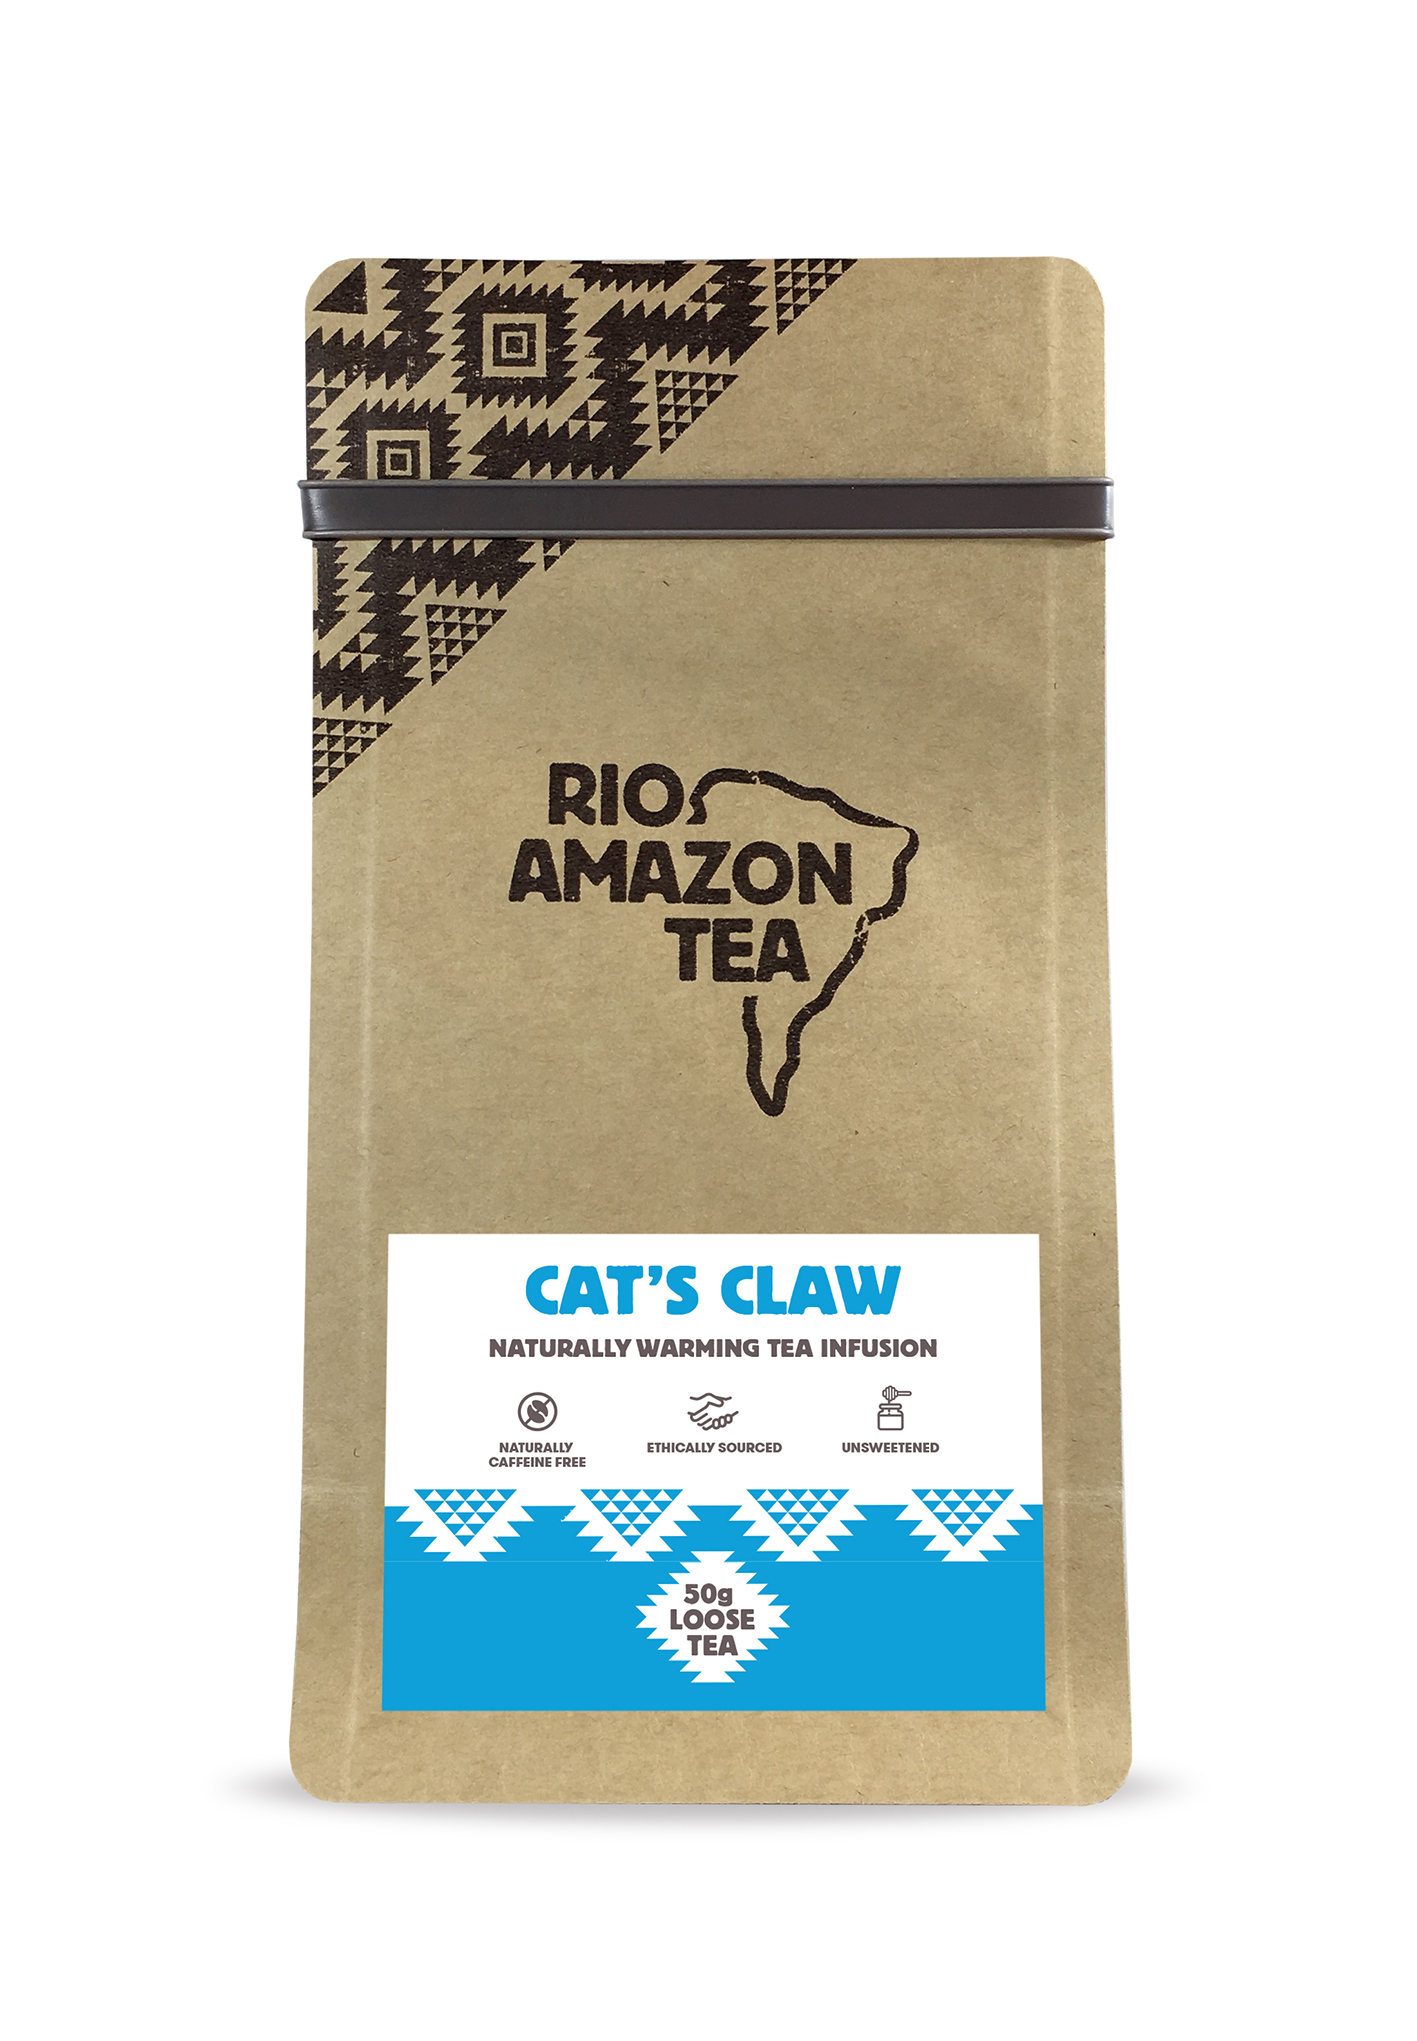 Cat's Claw Loose Tea 50g